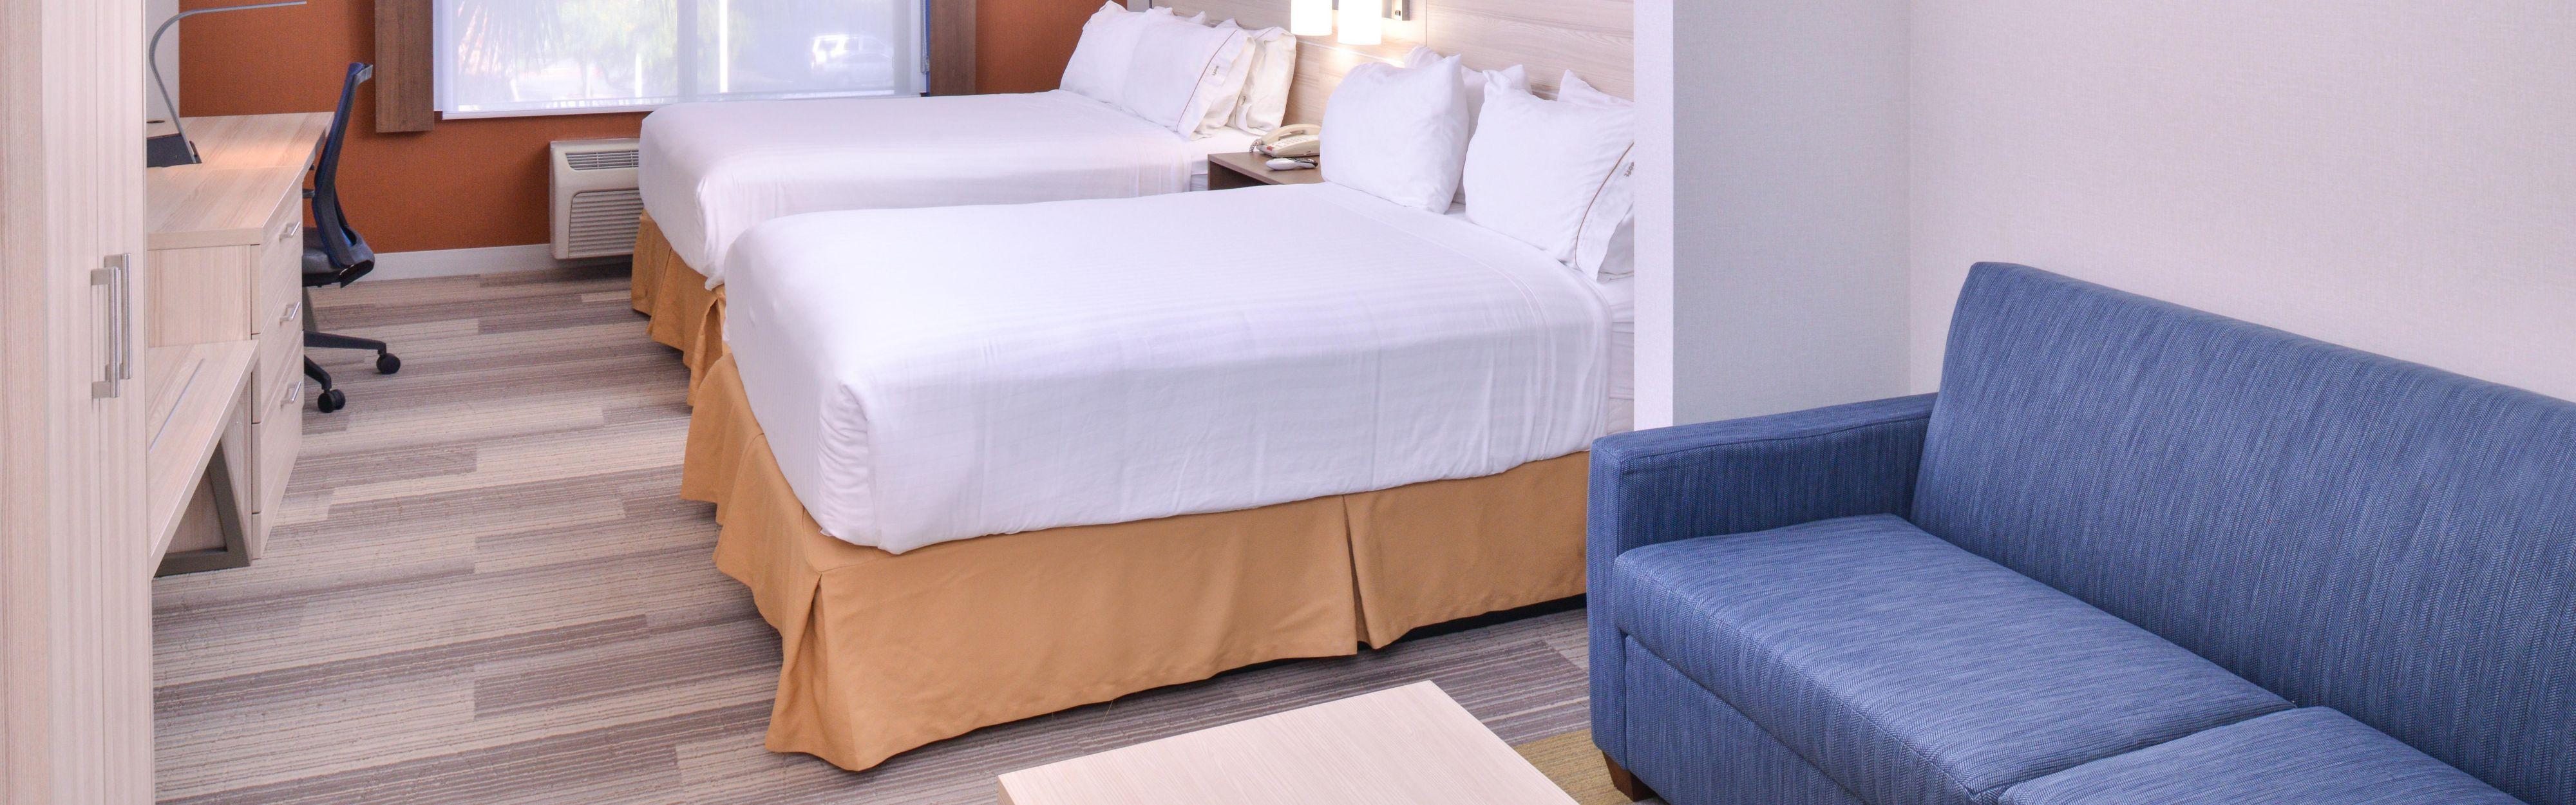 Holiday Inn Express & Suites San Diego Otay Mesa image 1